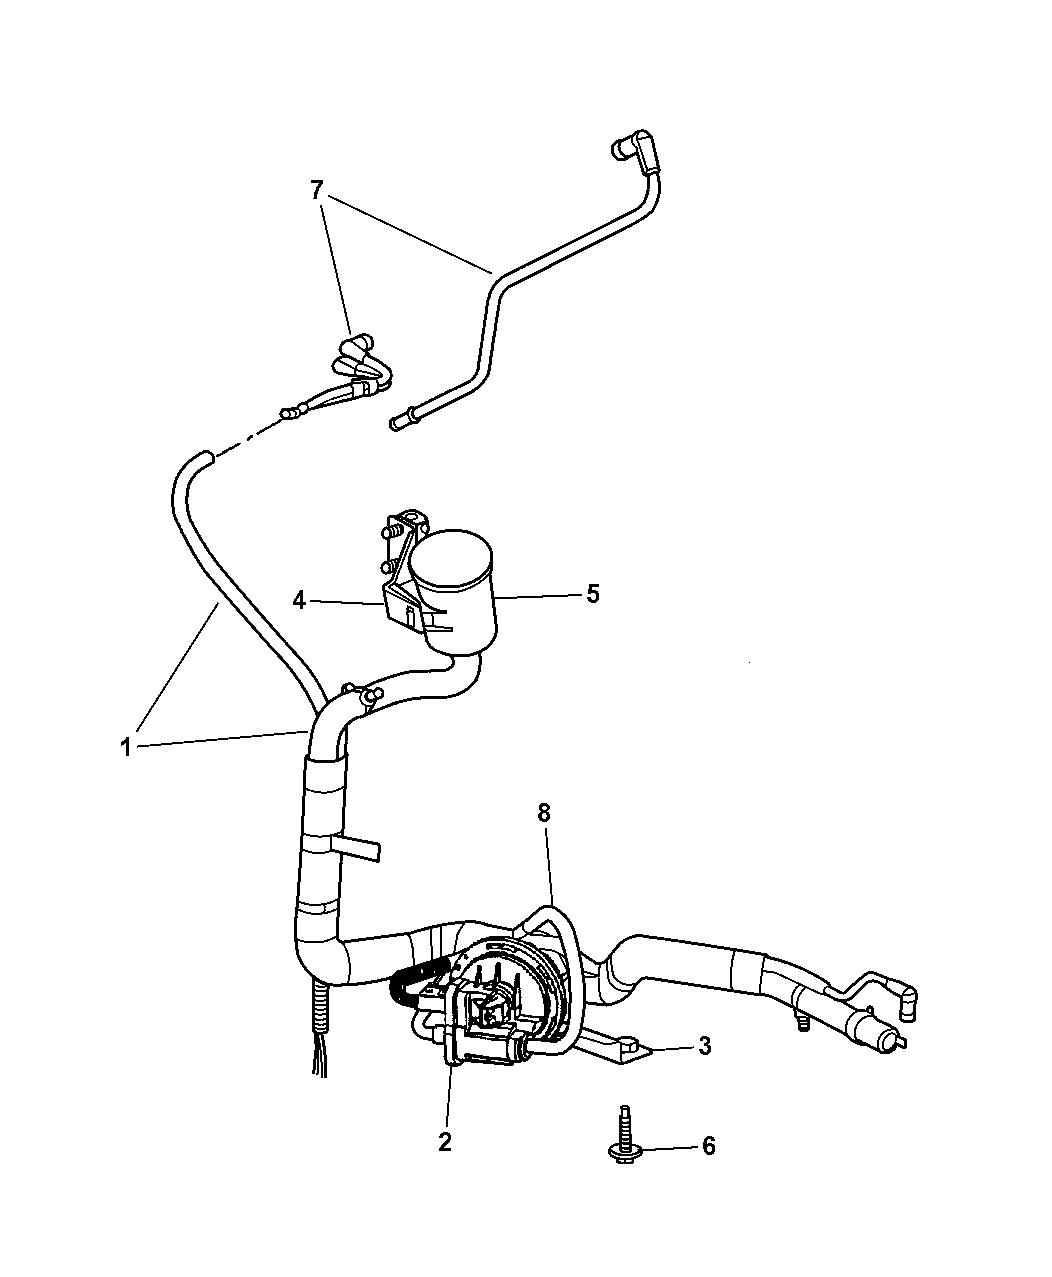 2002 Chrysler Town & Country Leak Detection Pump